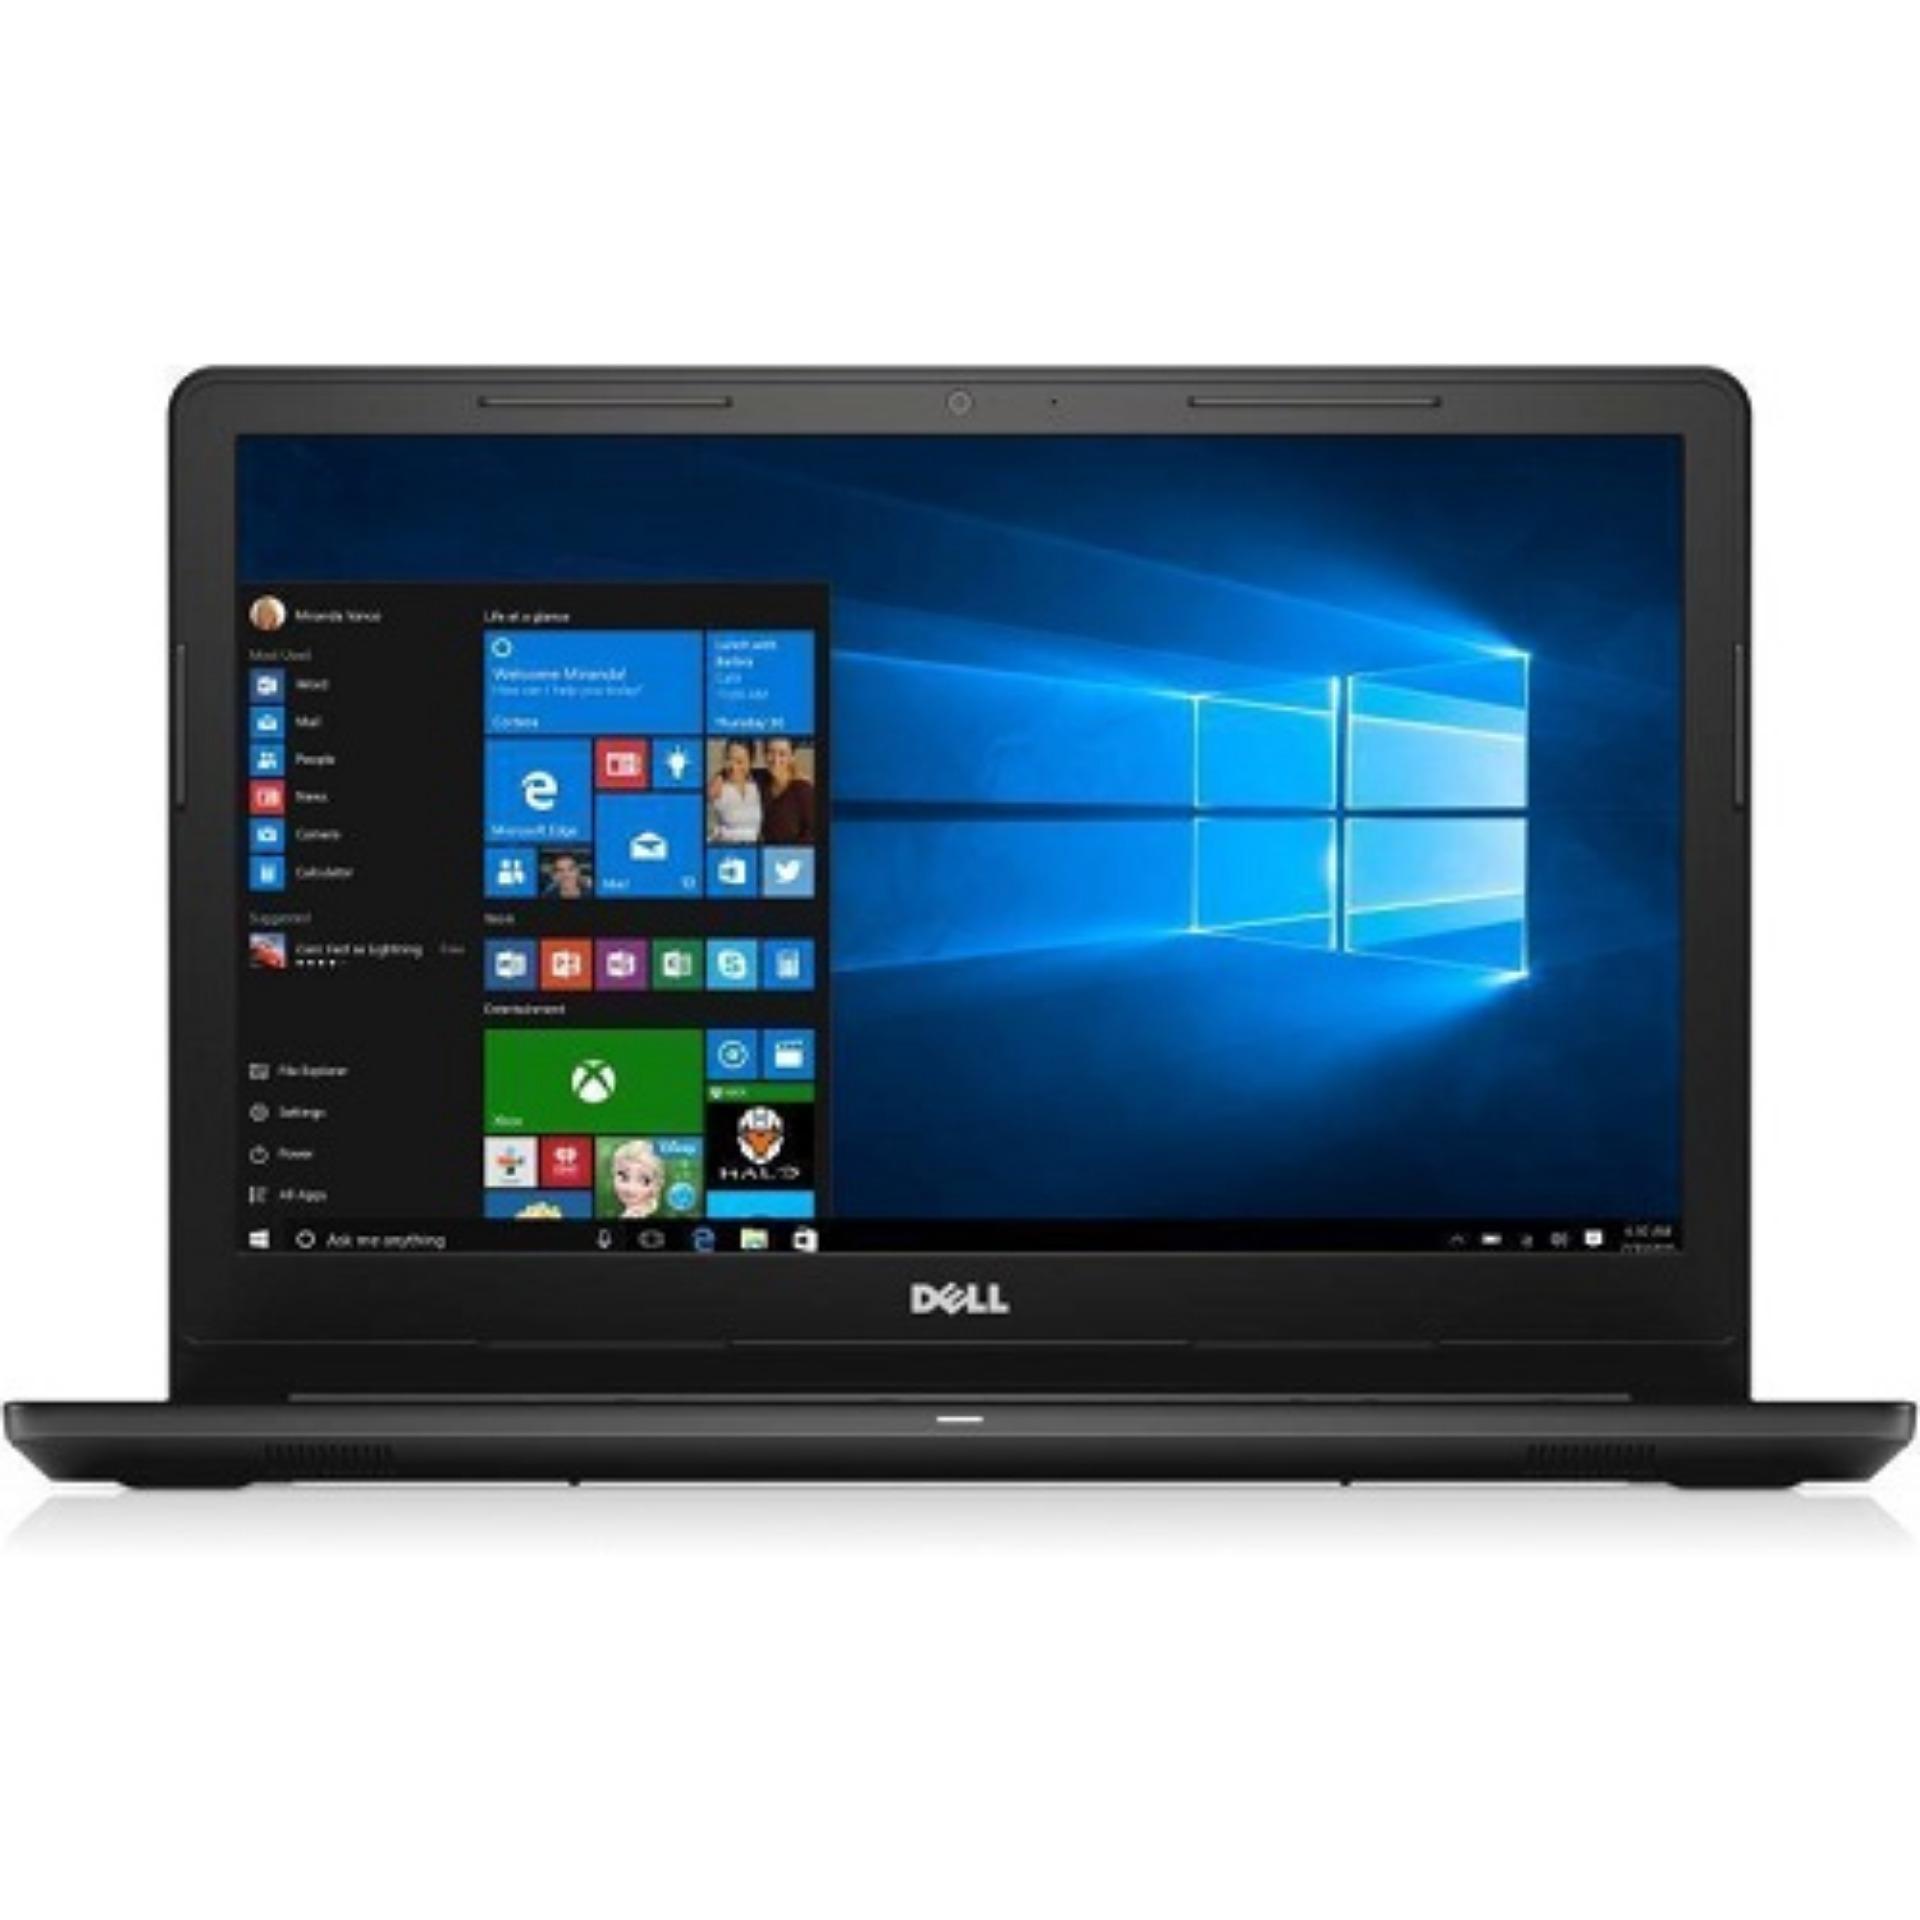 New INSPIRON 15 3000 SERIES 3567 6th Gen i3 6006U 4GB RAM 1TB Intel HD Graphics 520 graphics memory 15 inch display Windows10H LCD Back Cover for Black